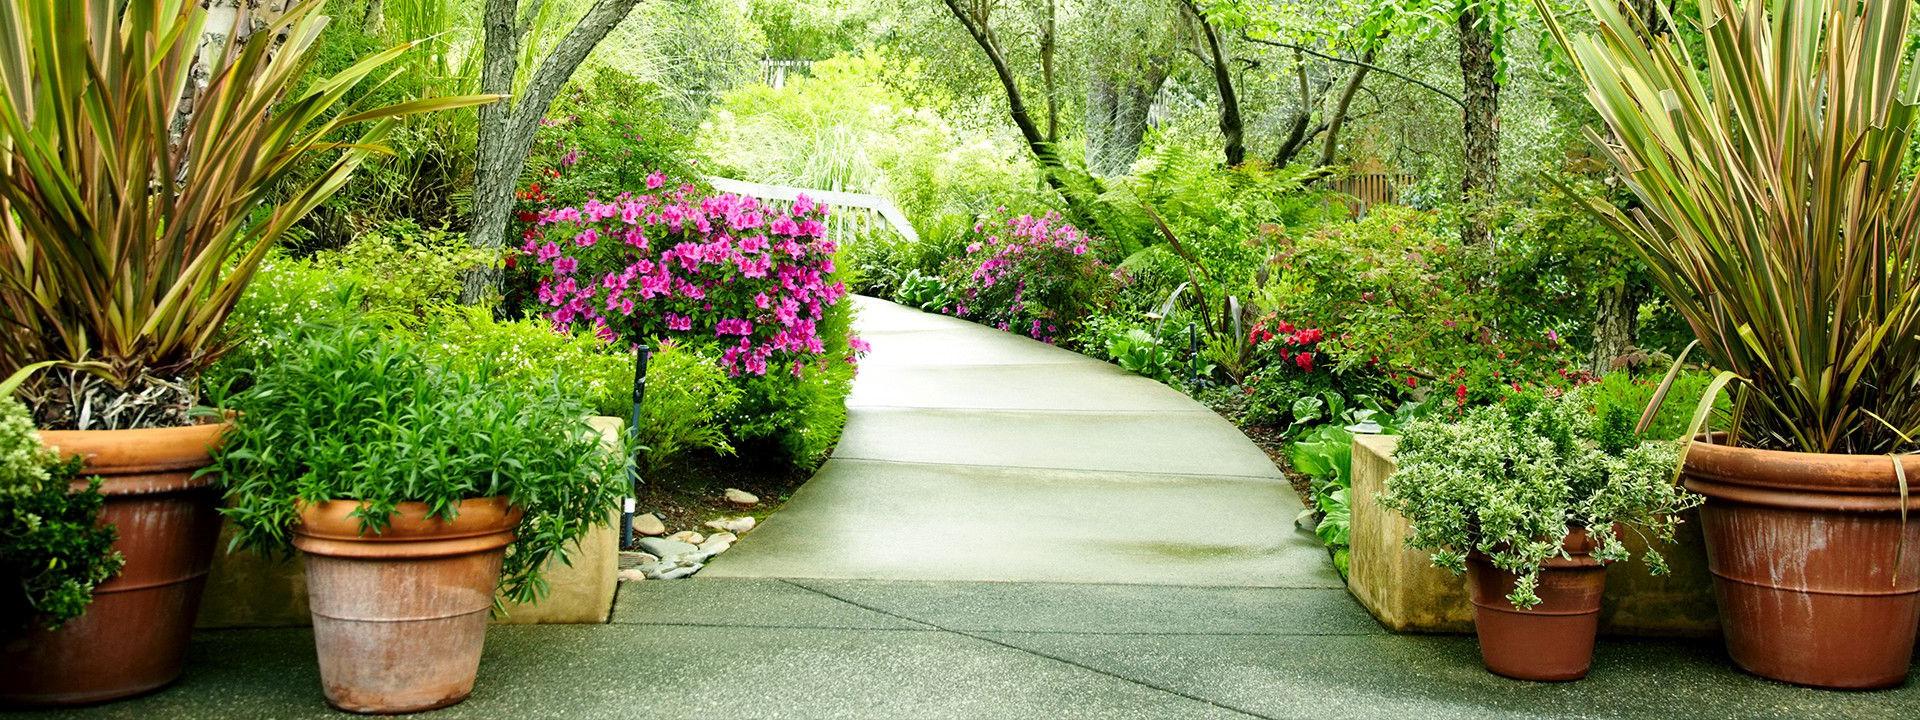 Resources | Framptom Funeral Home